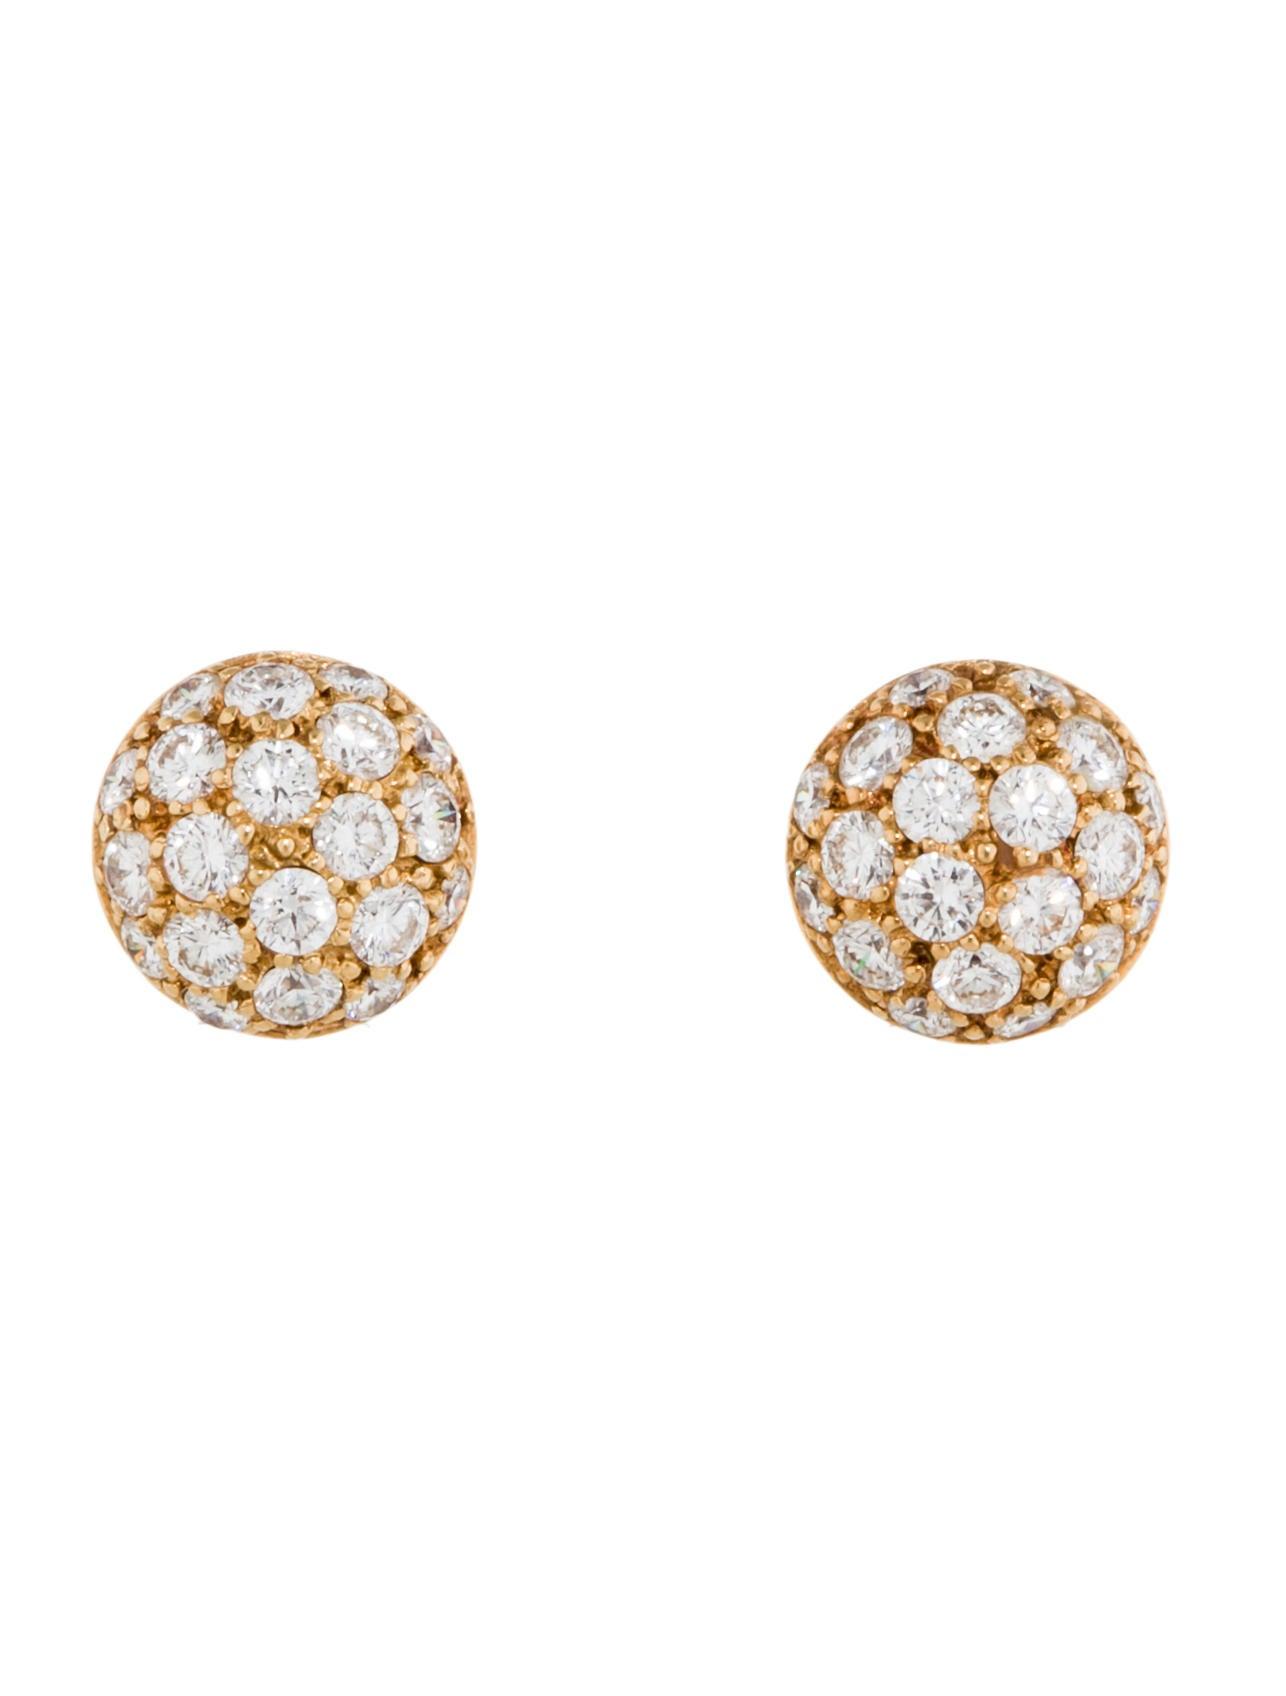 Cartier Earrings Studs Cartier Pavé Diamond Stud